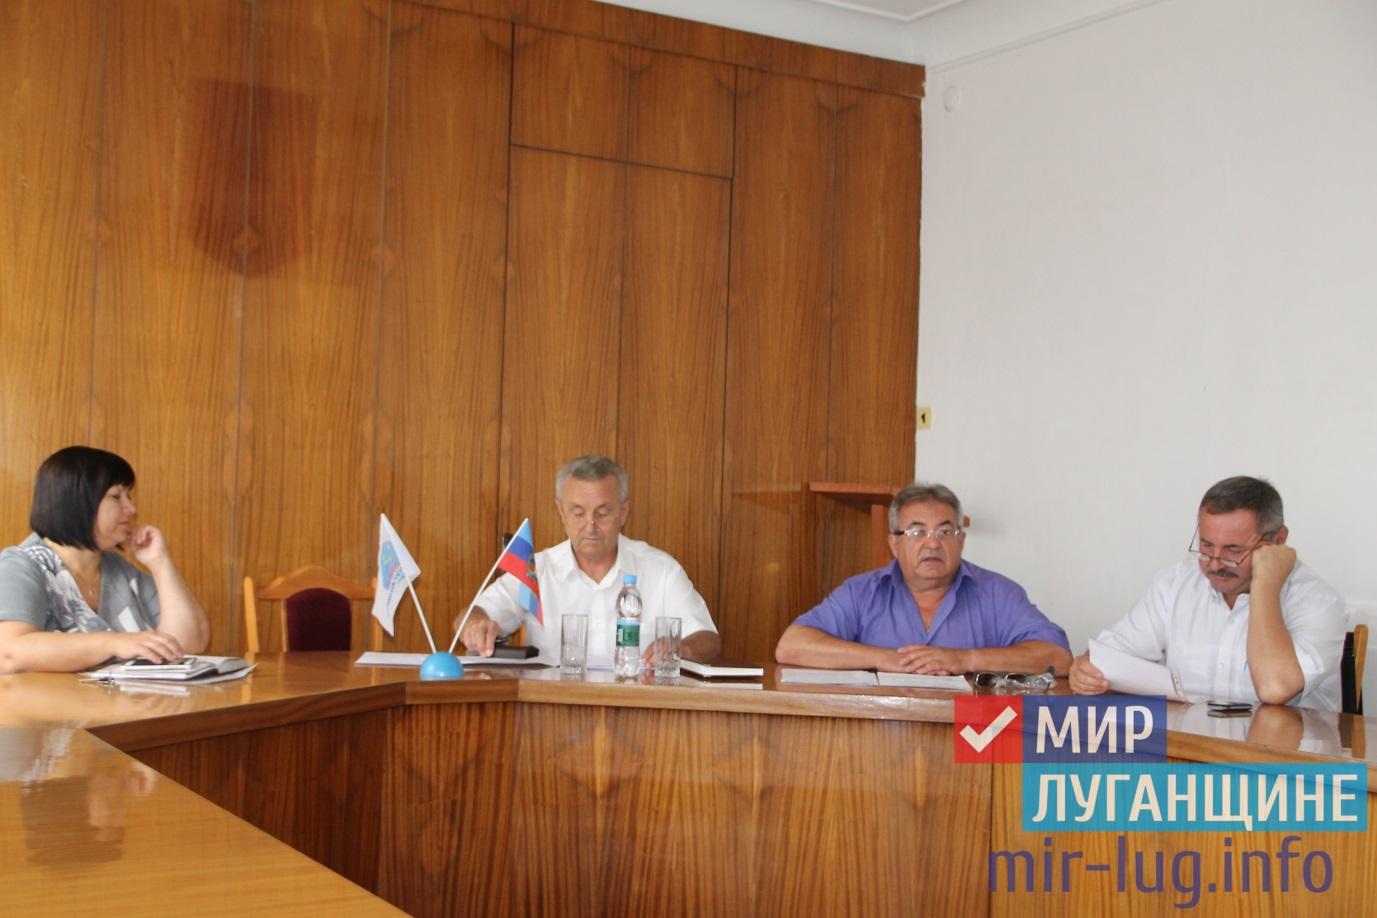 Министр сельского хозяйства ЛНР провел встречу с аграриями Антрацита 1